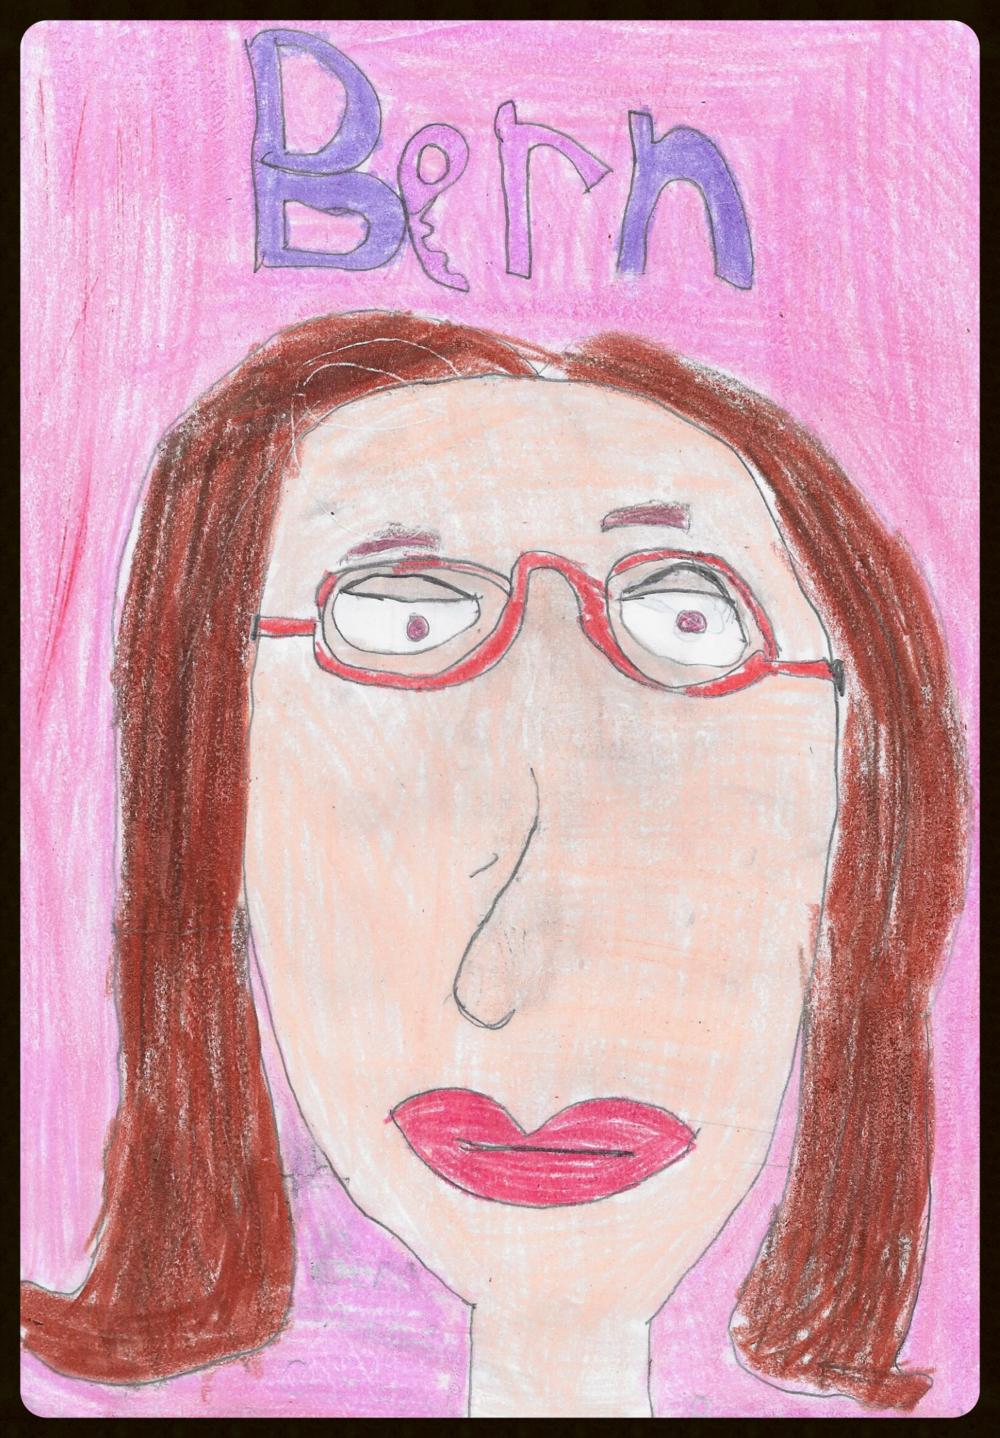 Bern Middleton - School Secretary